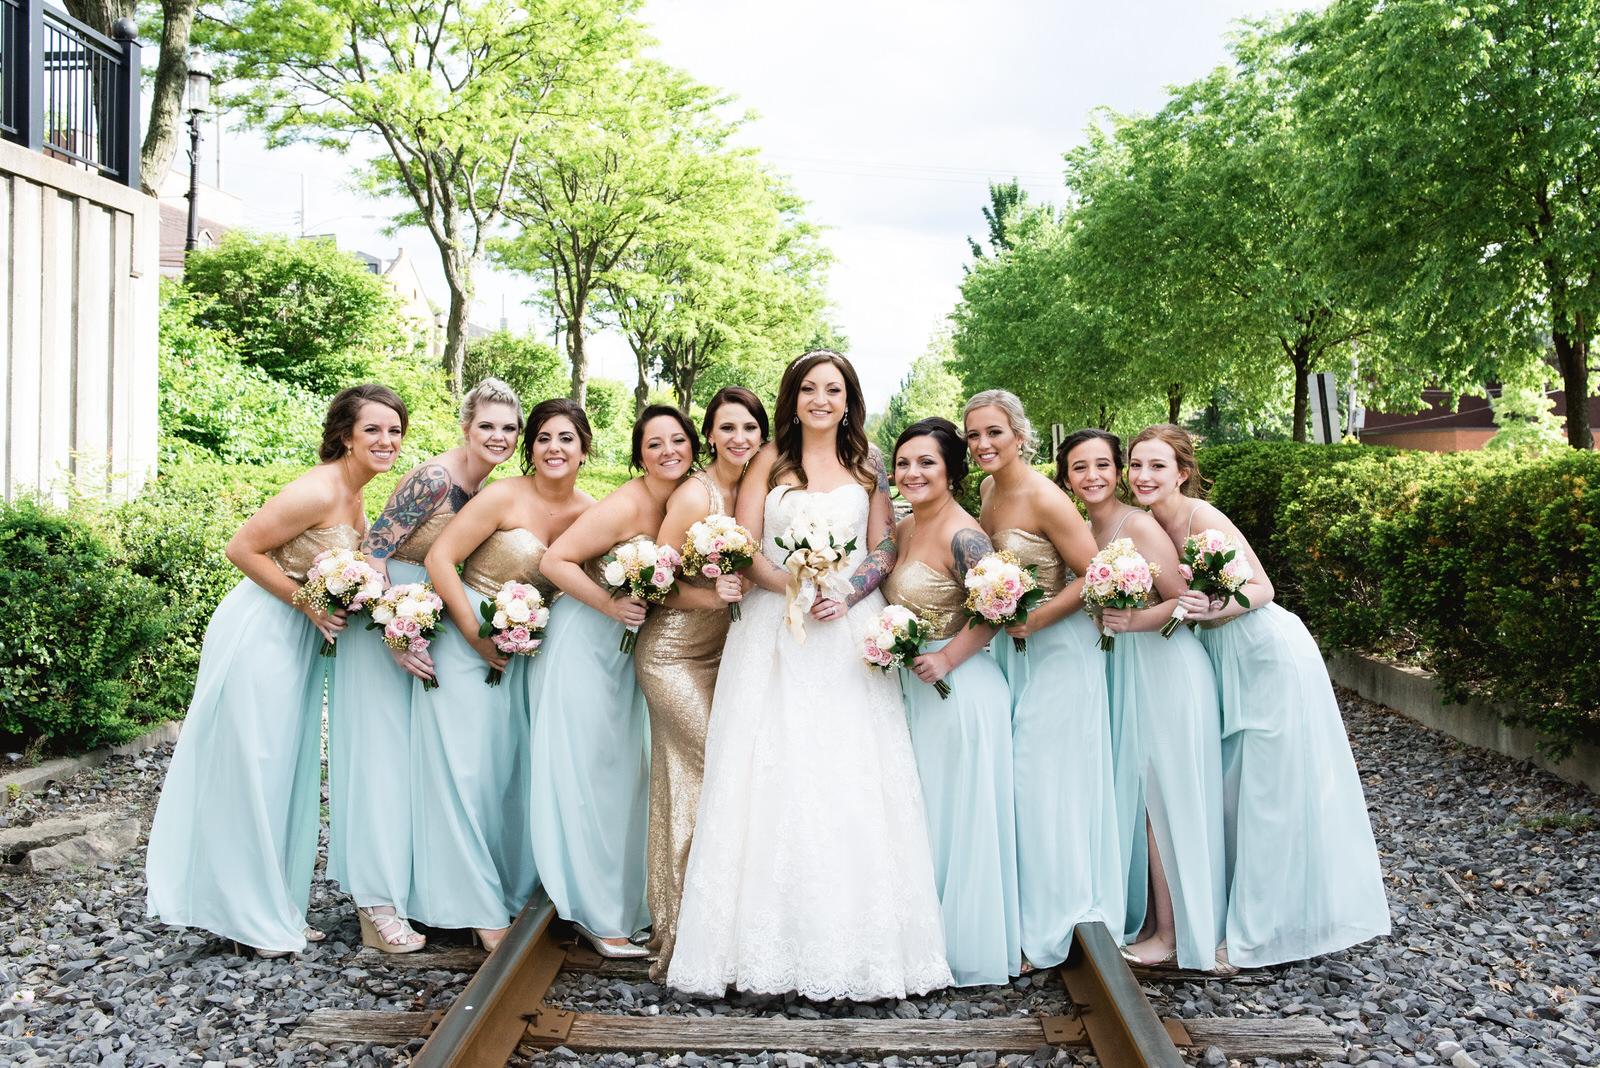 Laube_Banquet_Hall__Wedding_Photos_053.jpg